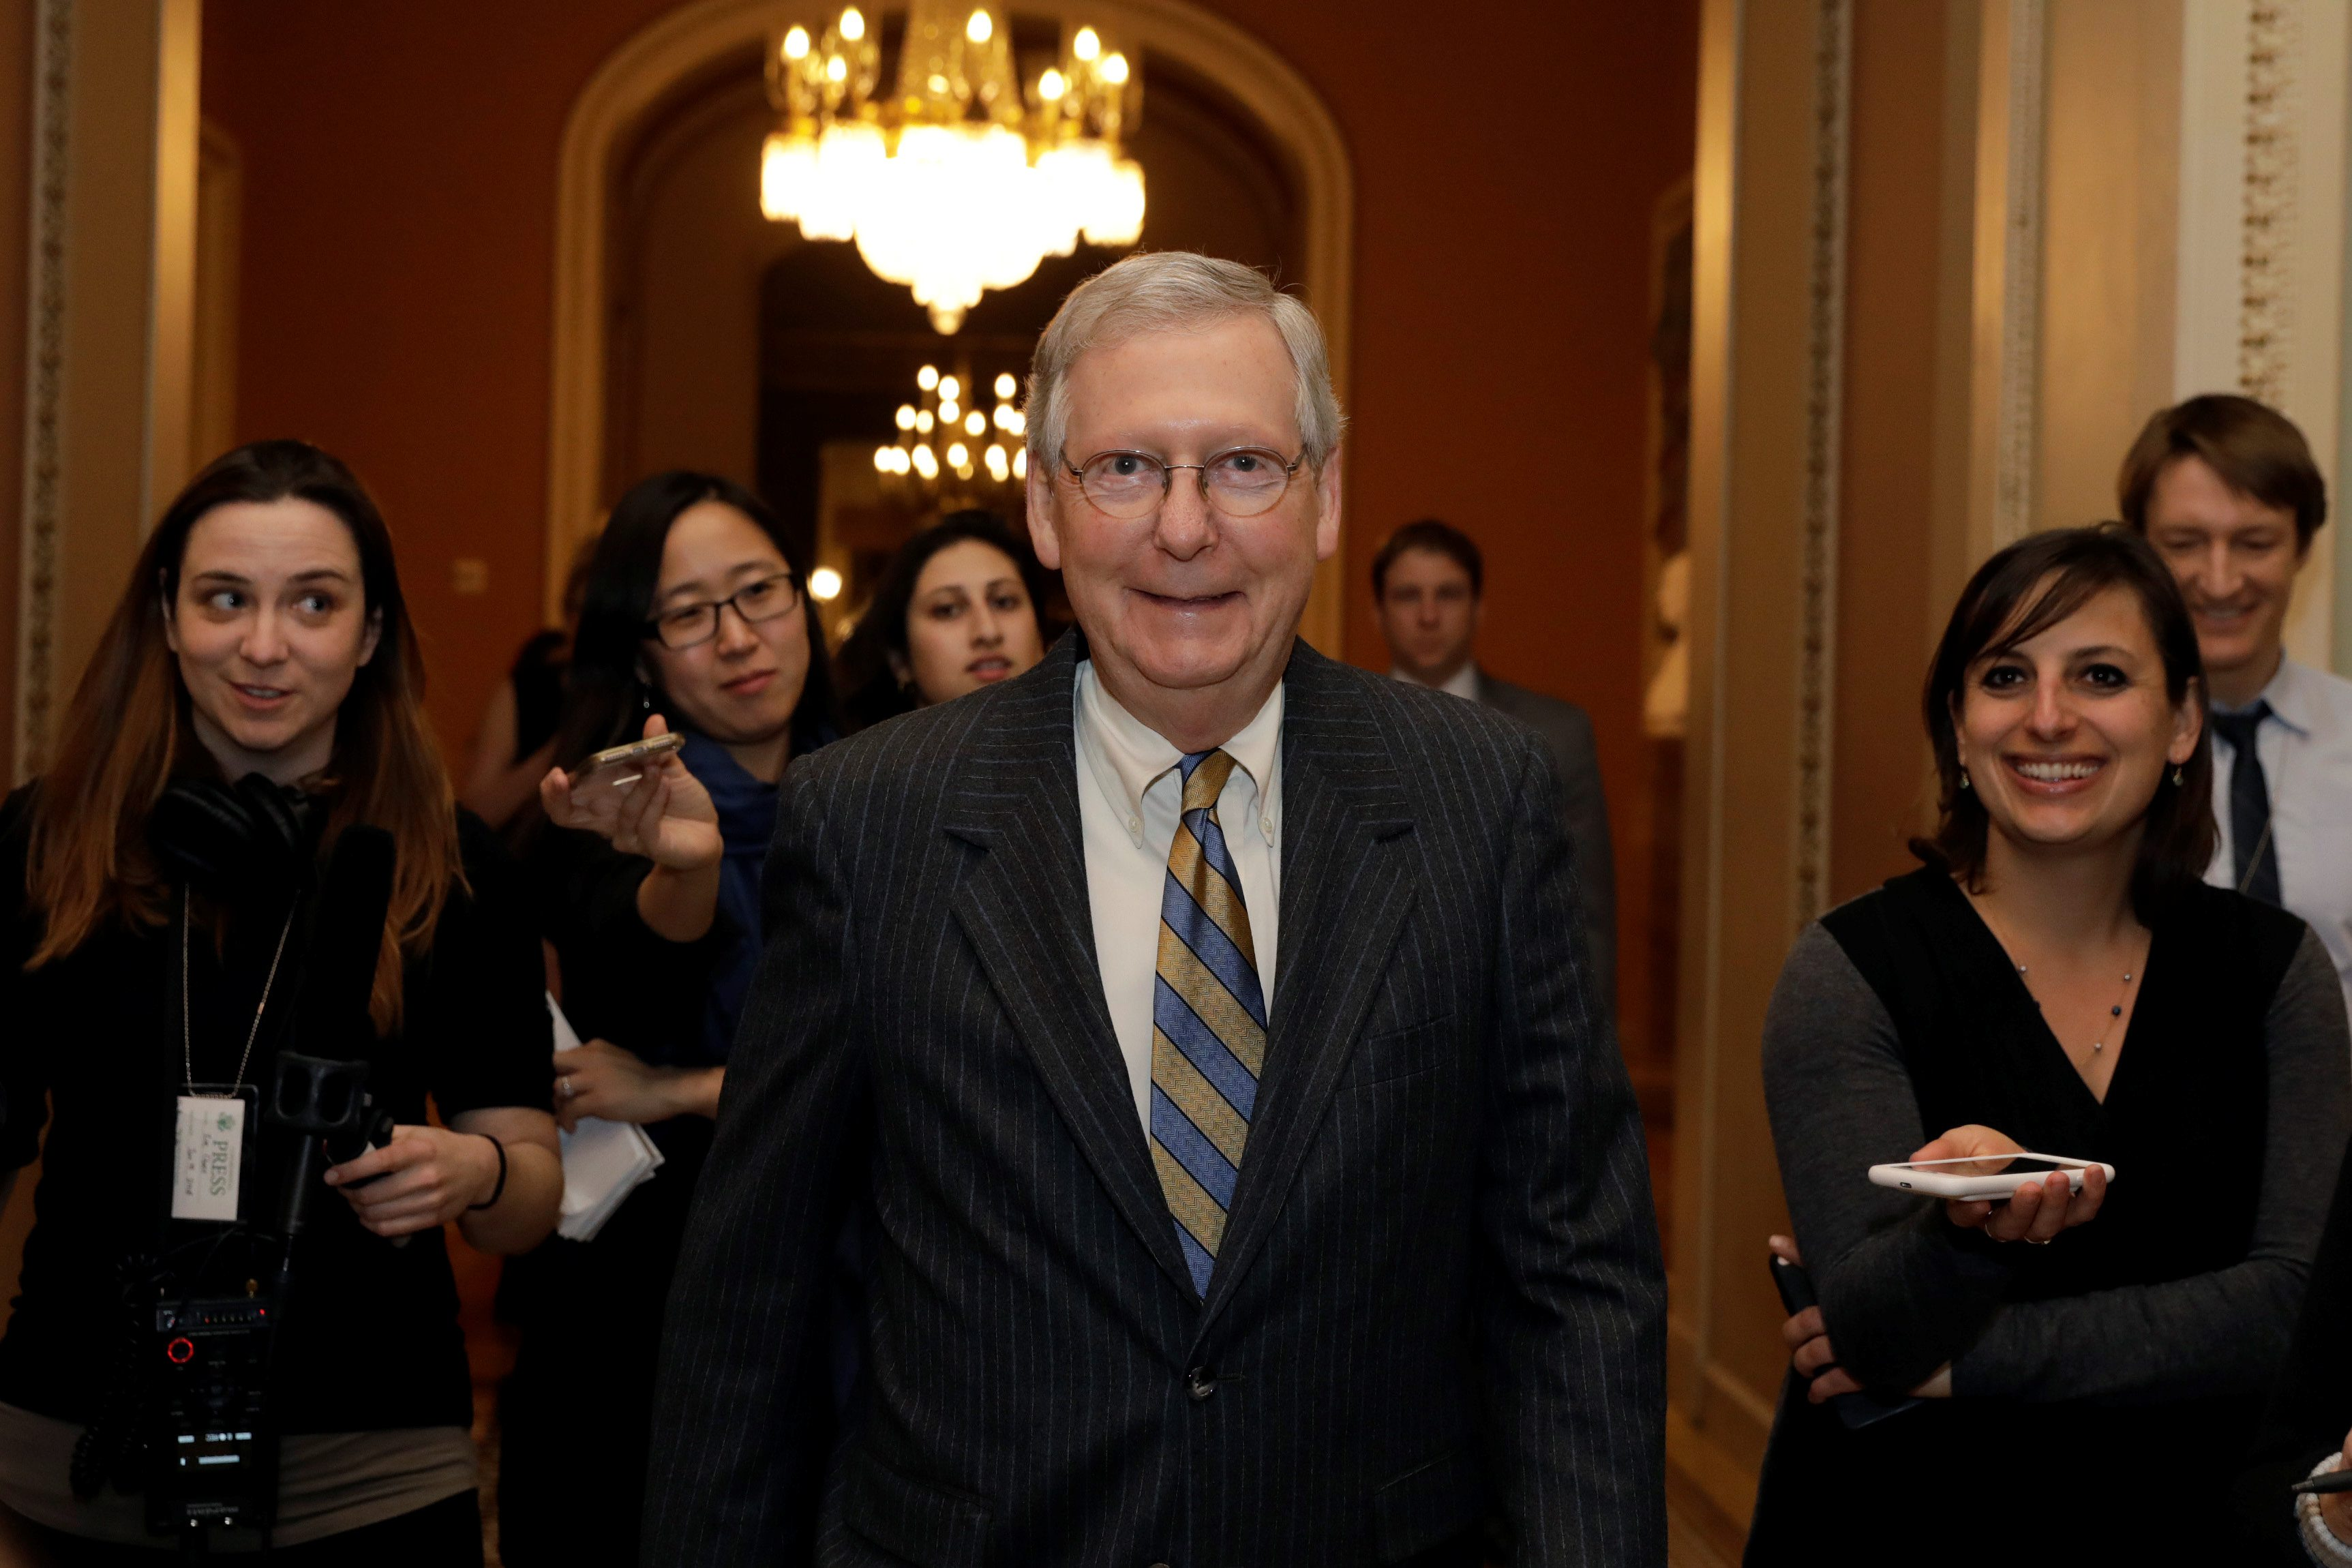 Vođa senatske republikanske većine Mitch McConnell